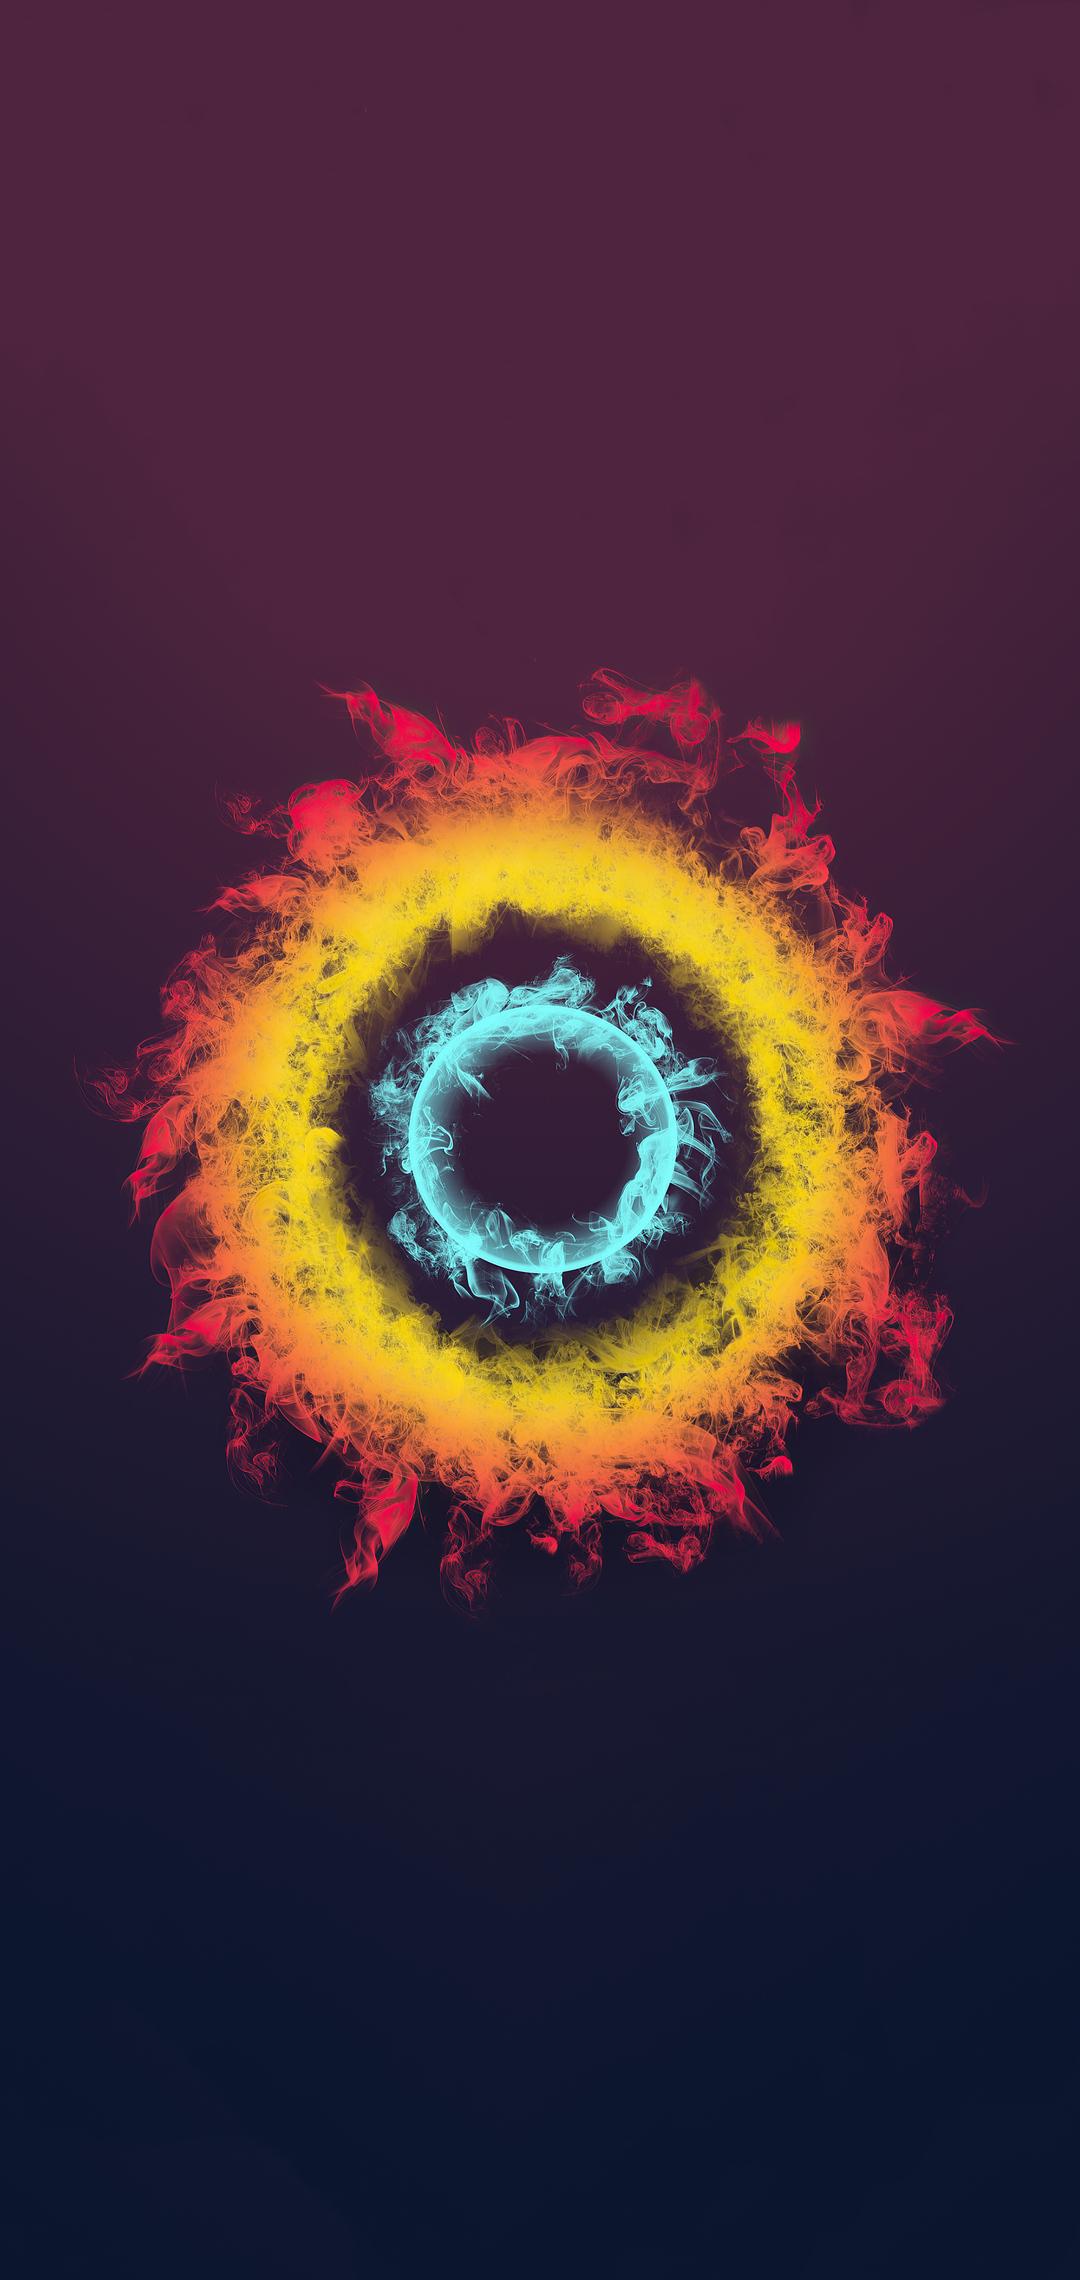 fire-circle-abstract-4k-uq.jpg